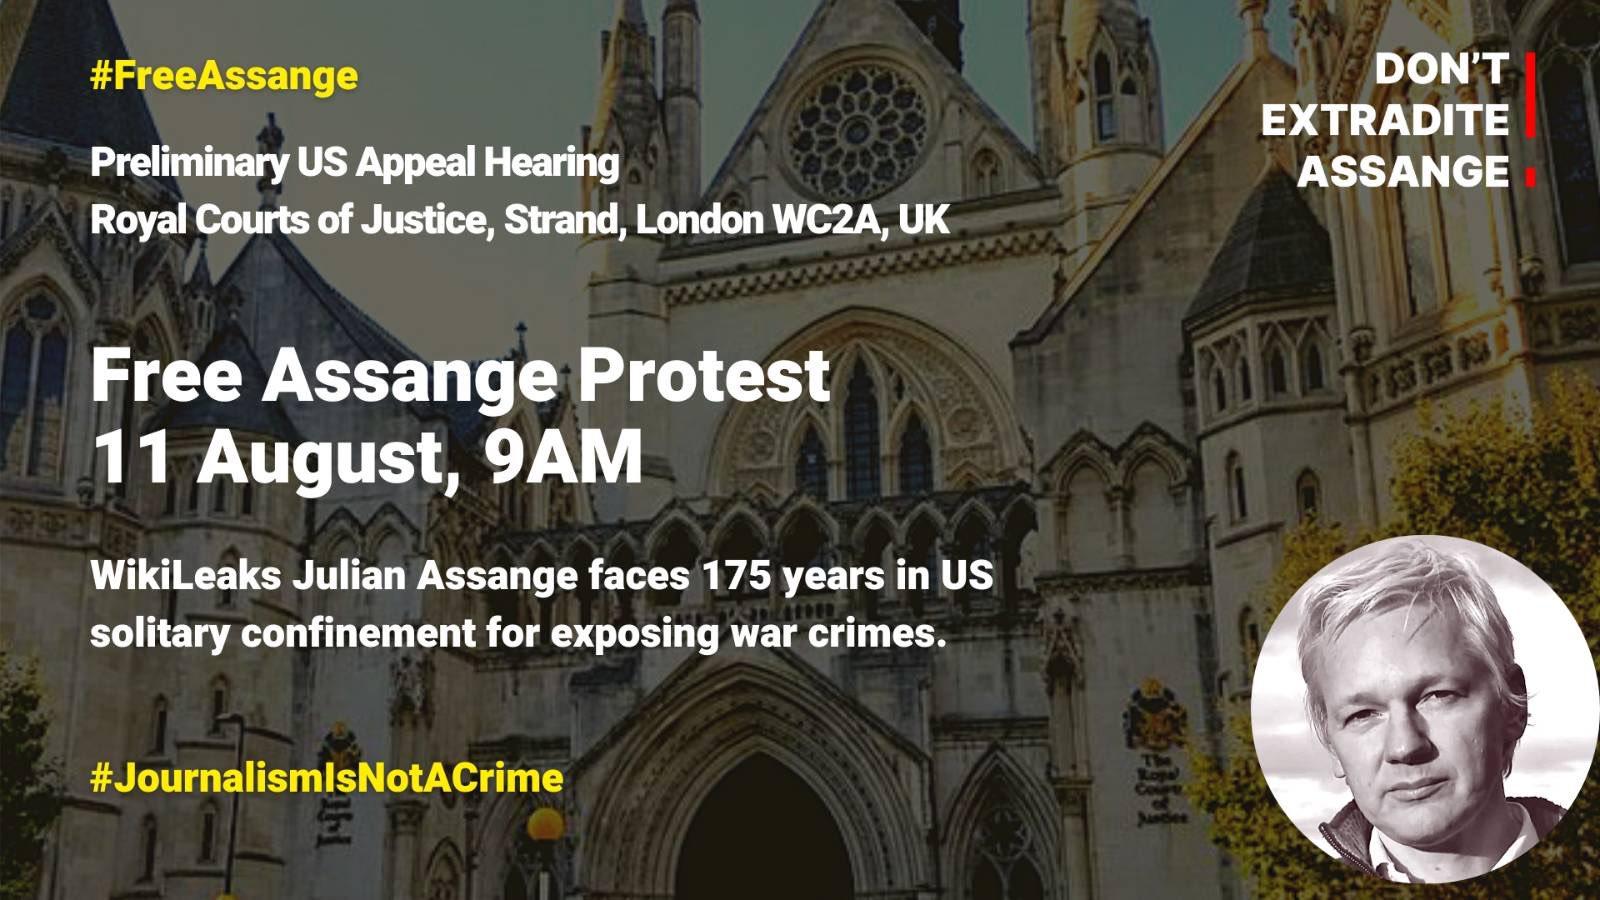 usa_uk_vs._assange:media_e7c89qexmamtus6.jpg_name_orig.jpeg